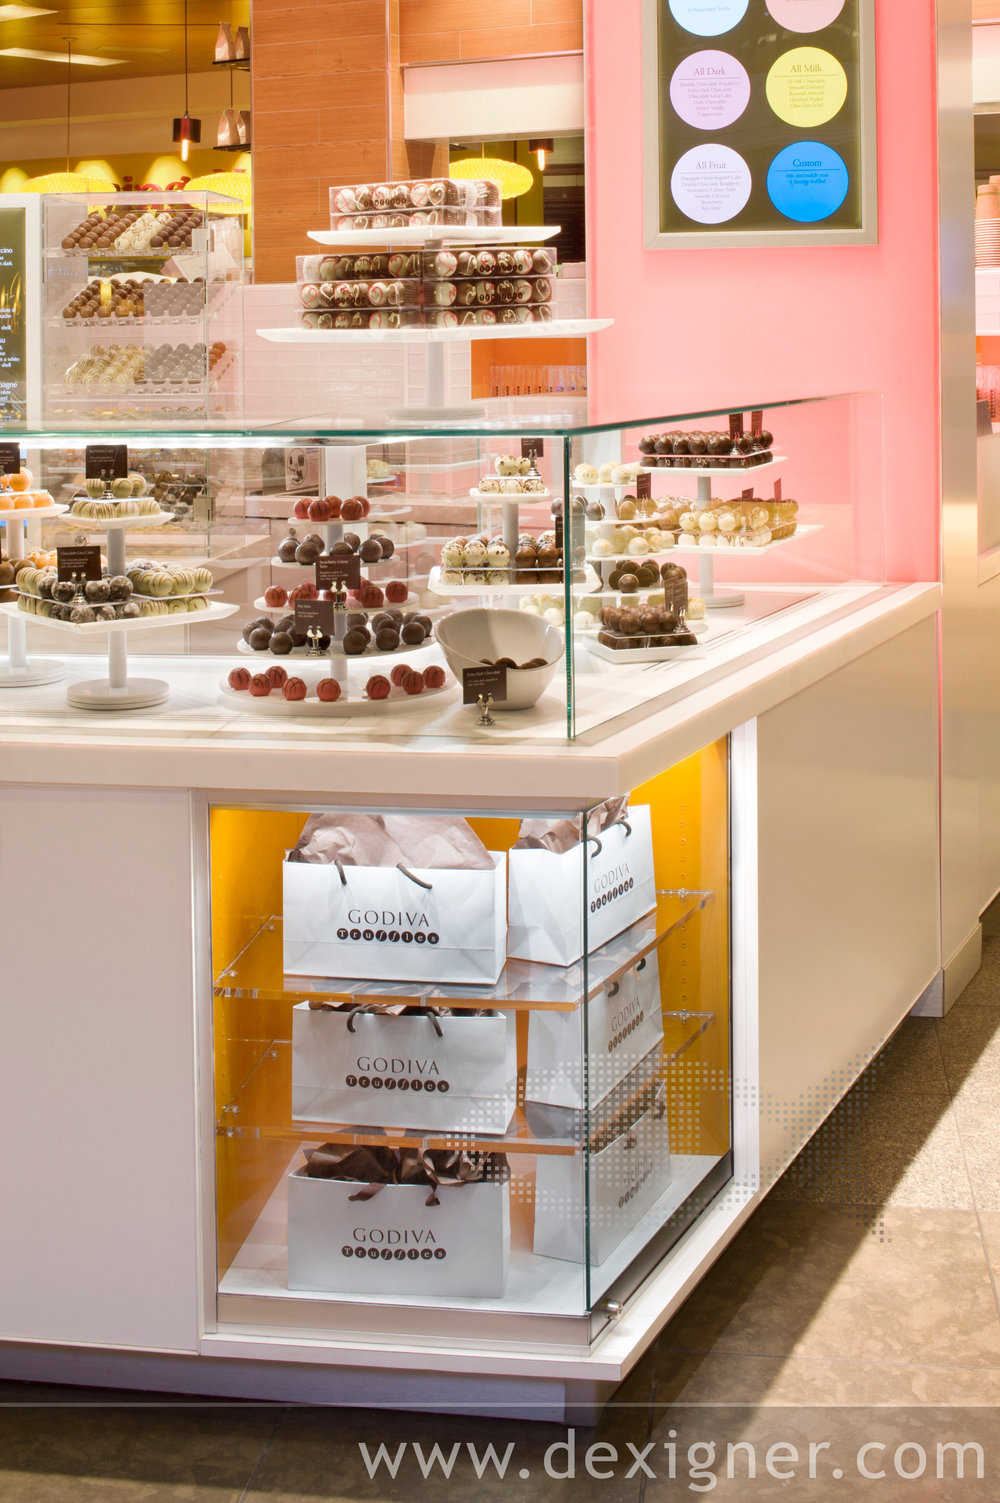 Godiva_Truffle_Express_Chocolate_Kiosk_03.jpg